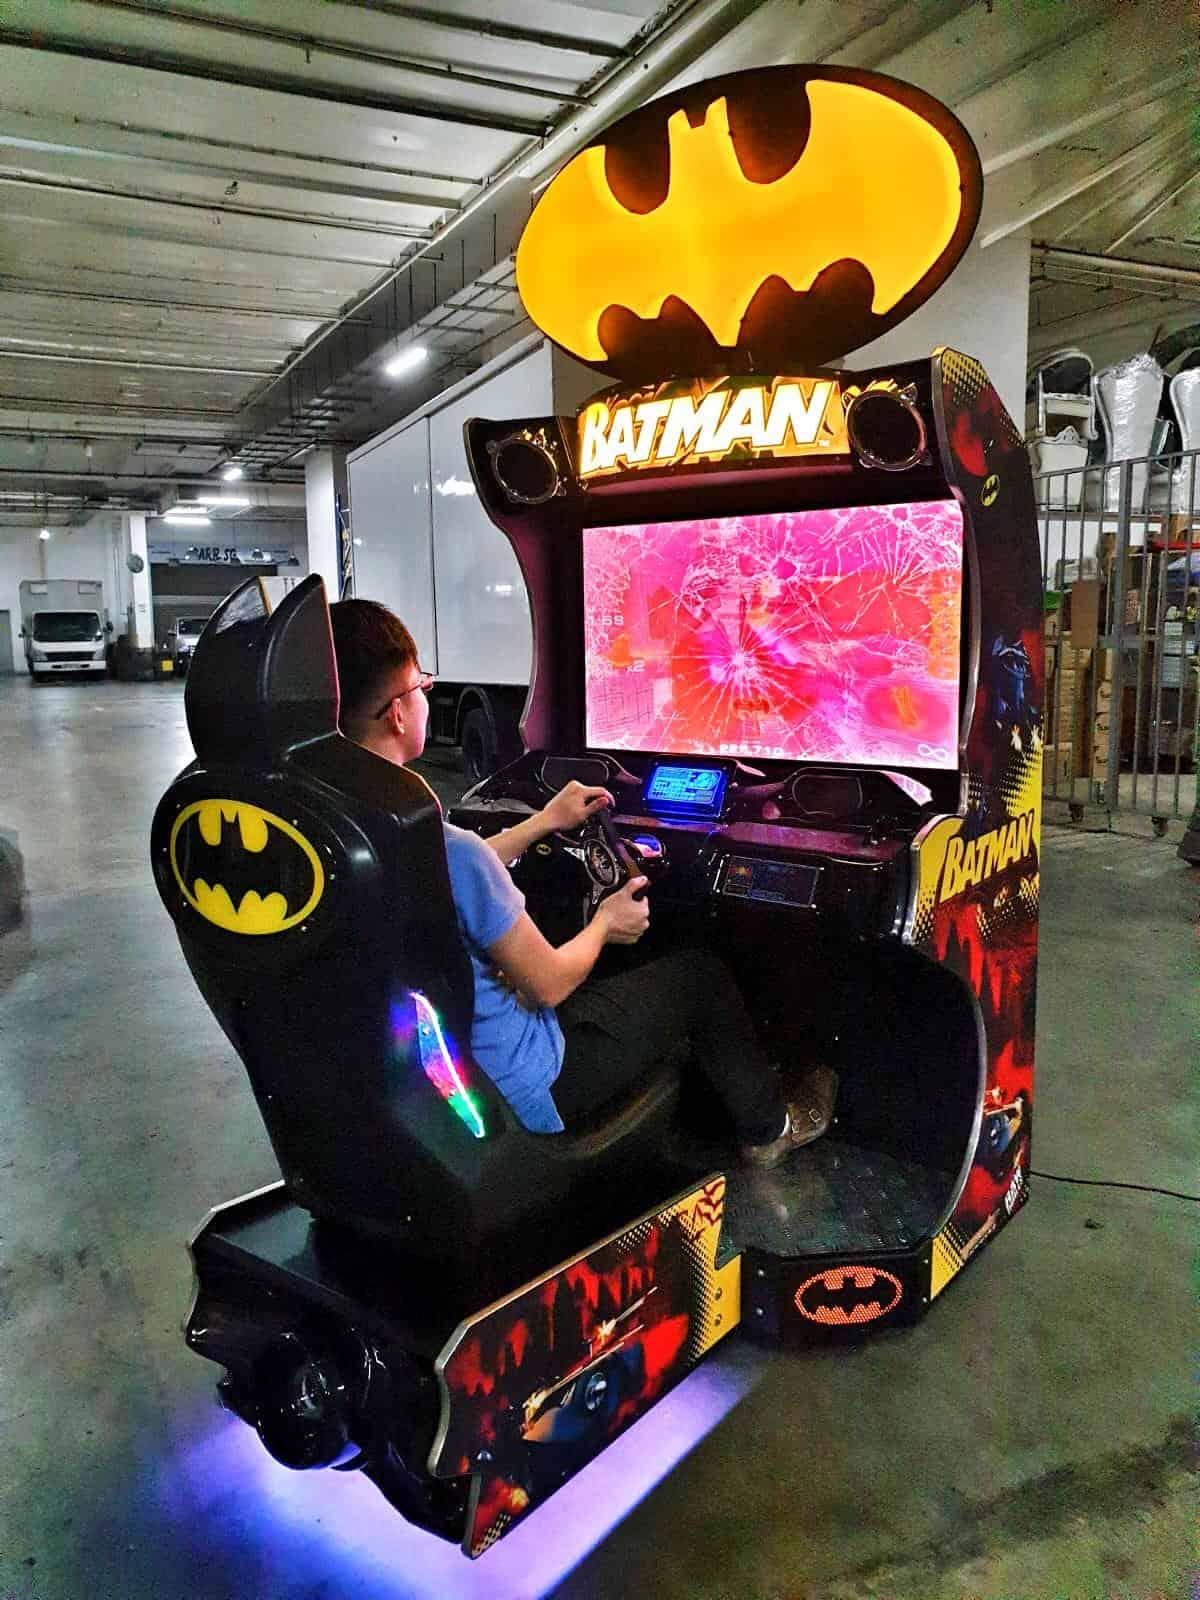 Arcade Racing Batman Machine for Rent